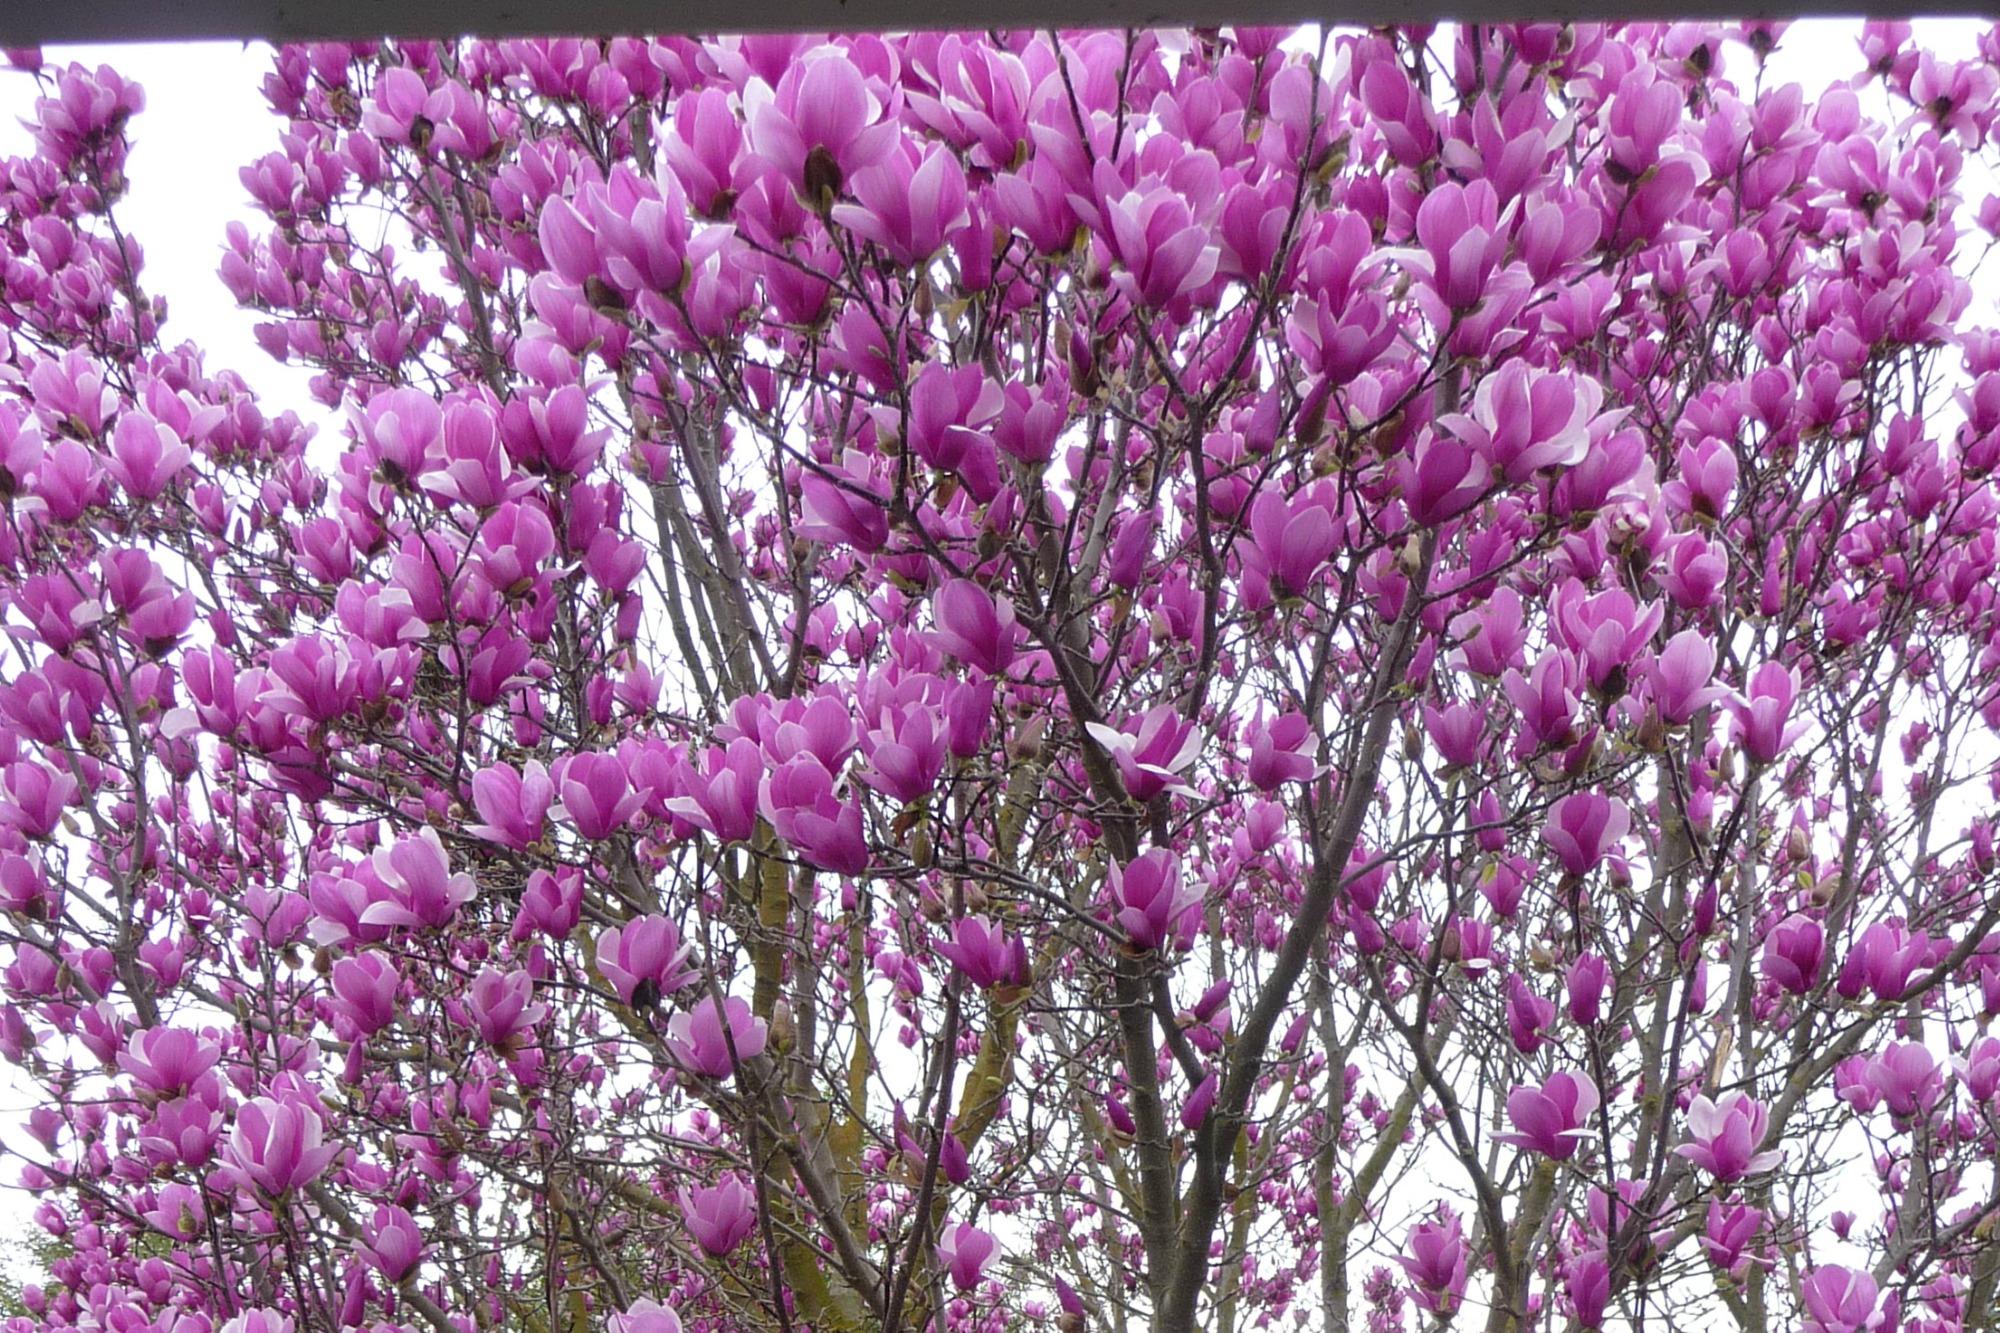 Magnolia blossoms blogpost